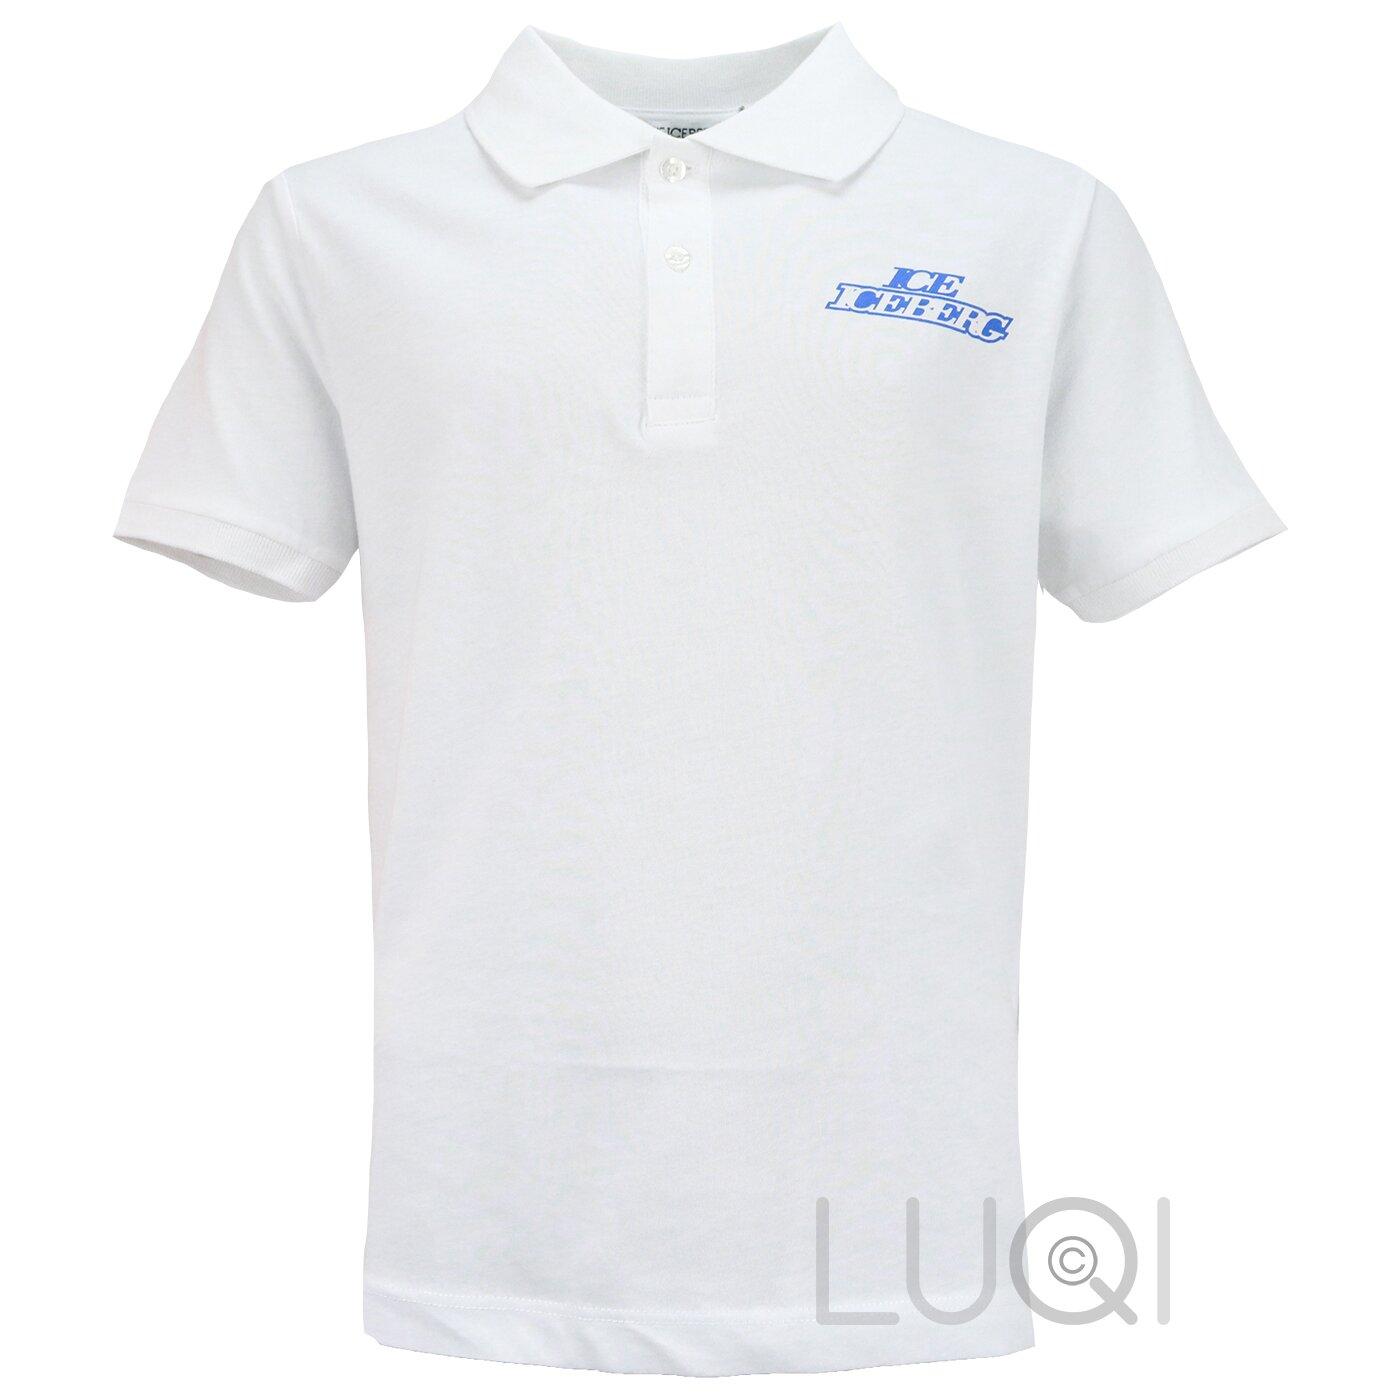 Iceberg Poloshirt Wit met blauw logo